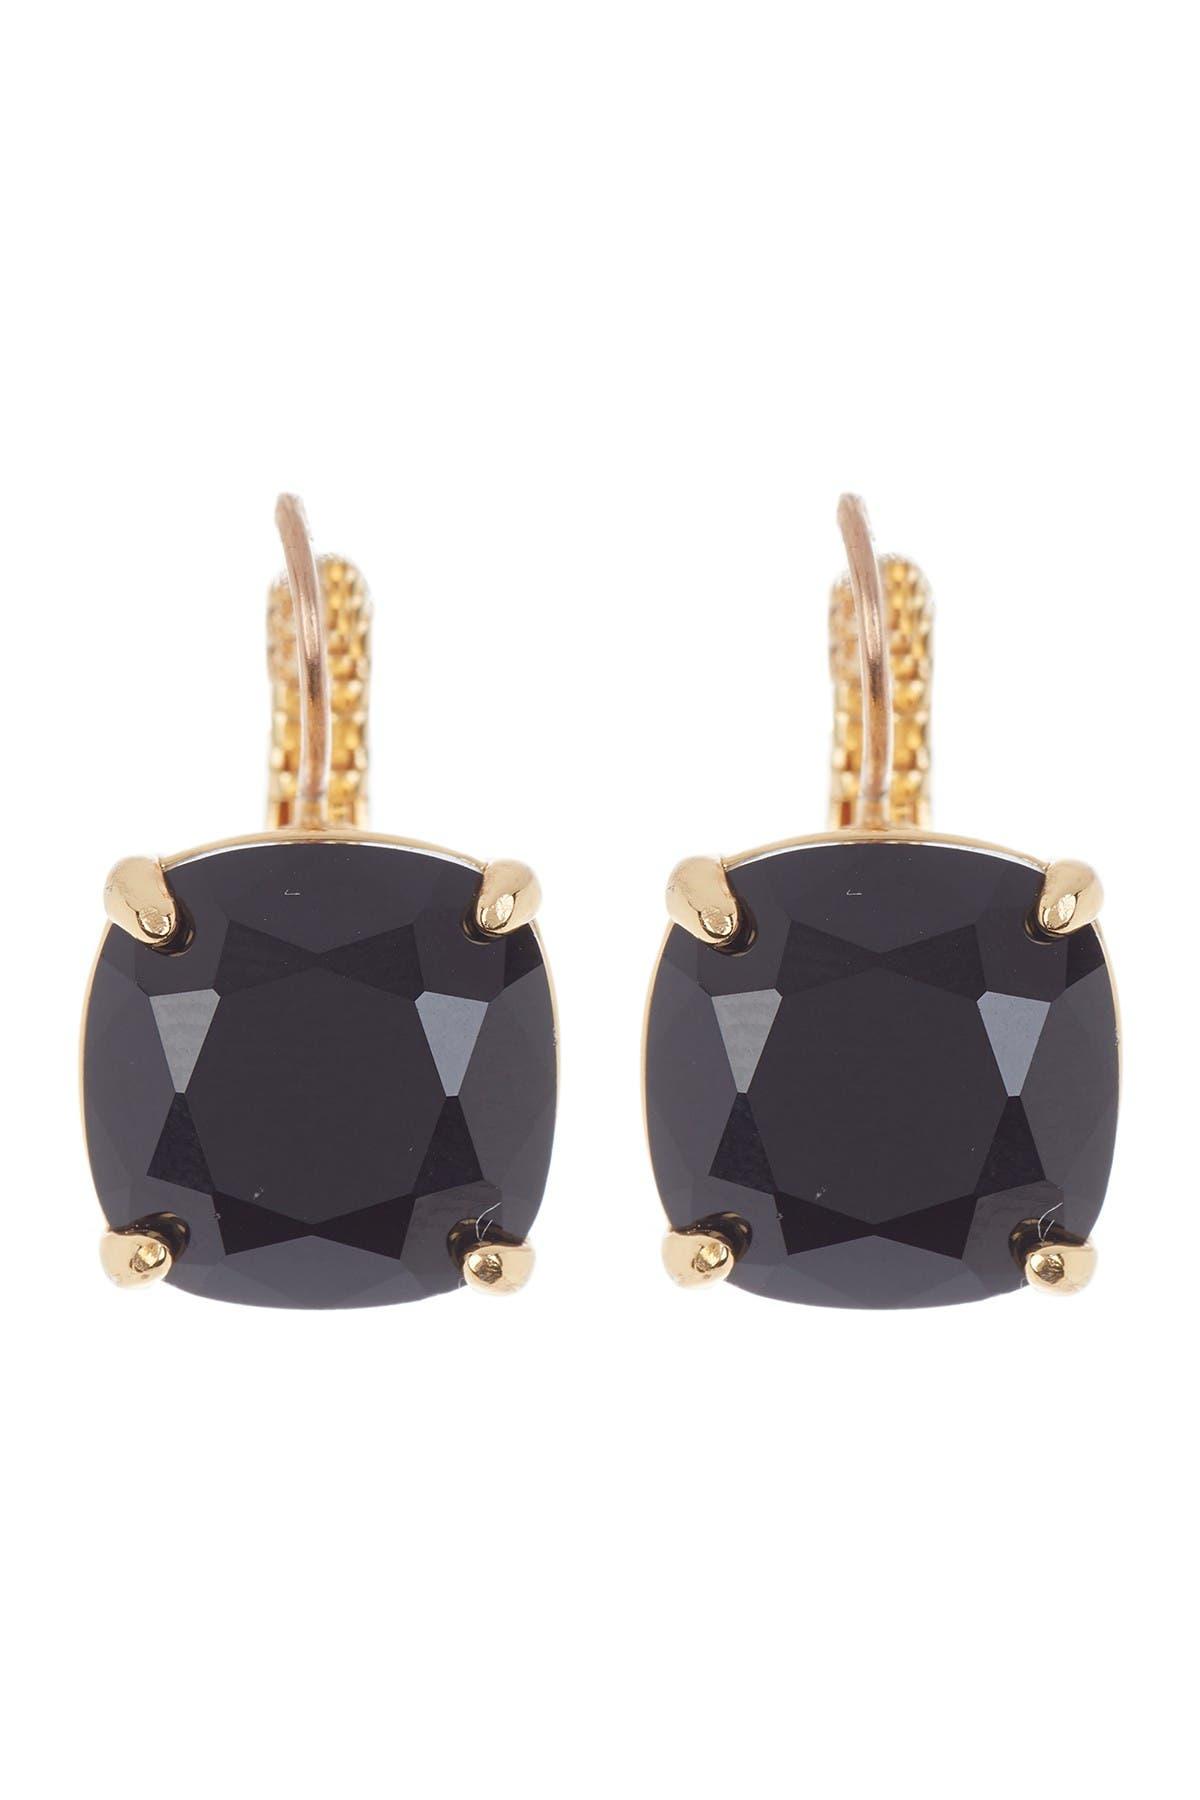 Image of kate spade new york square black cz drop earrings